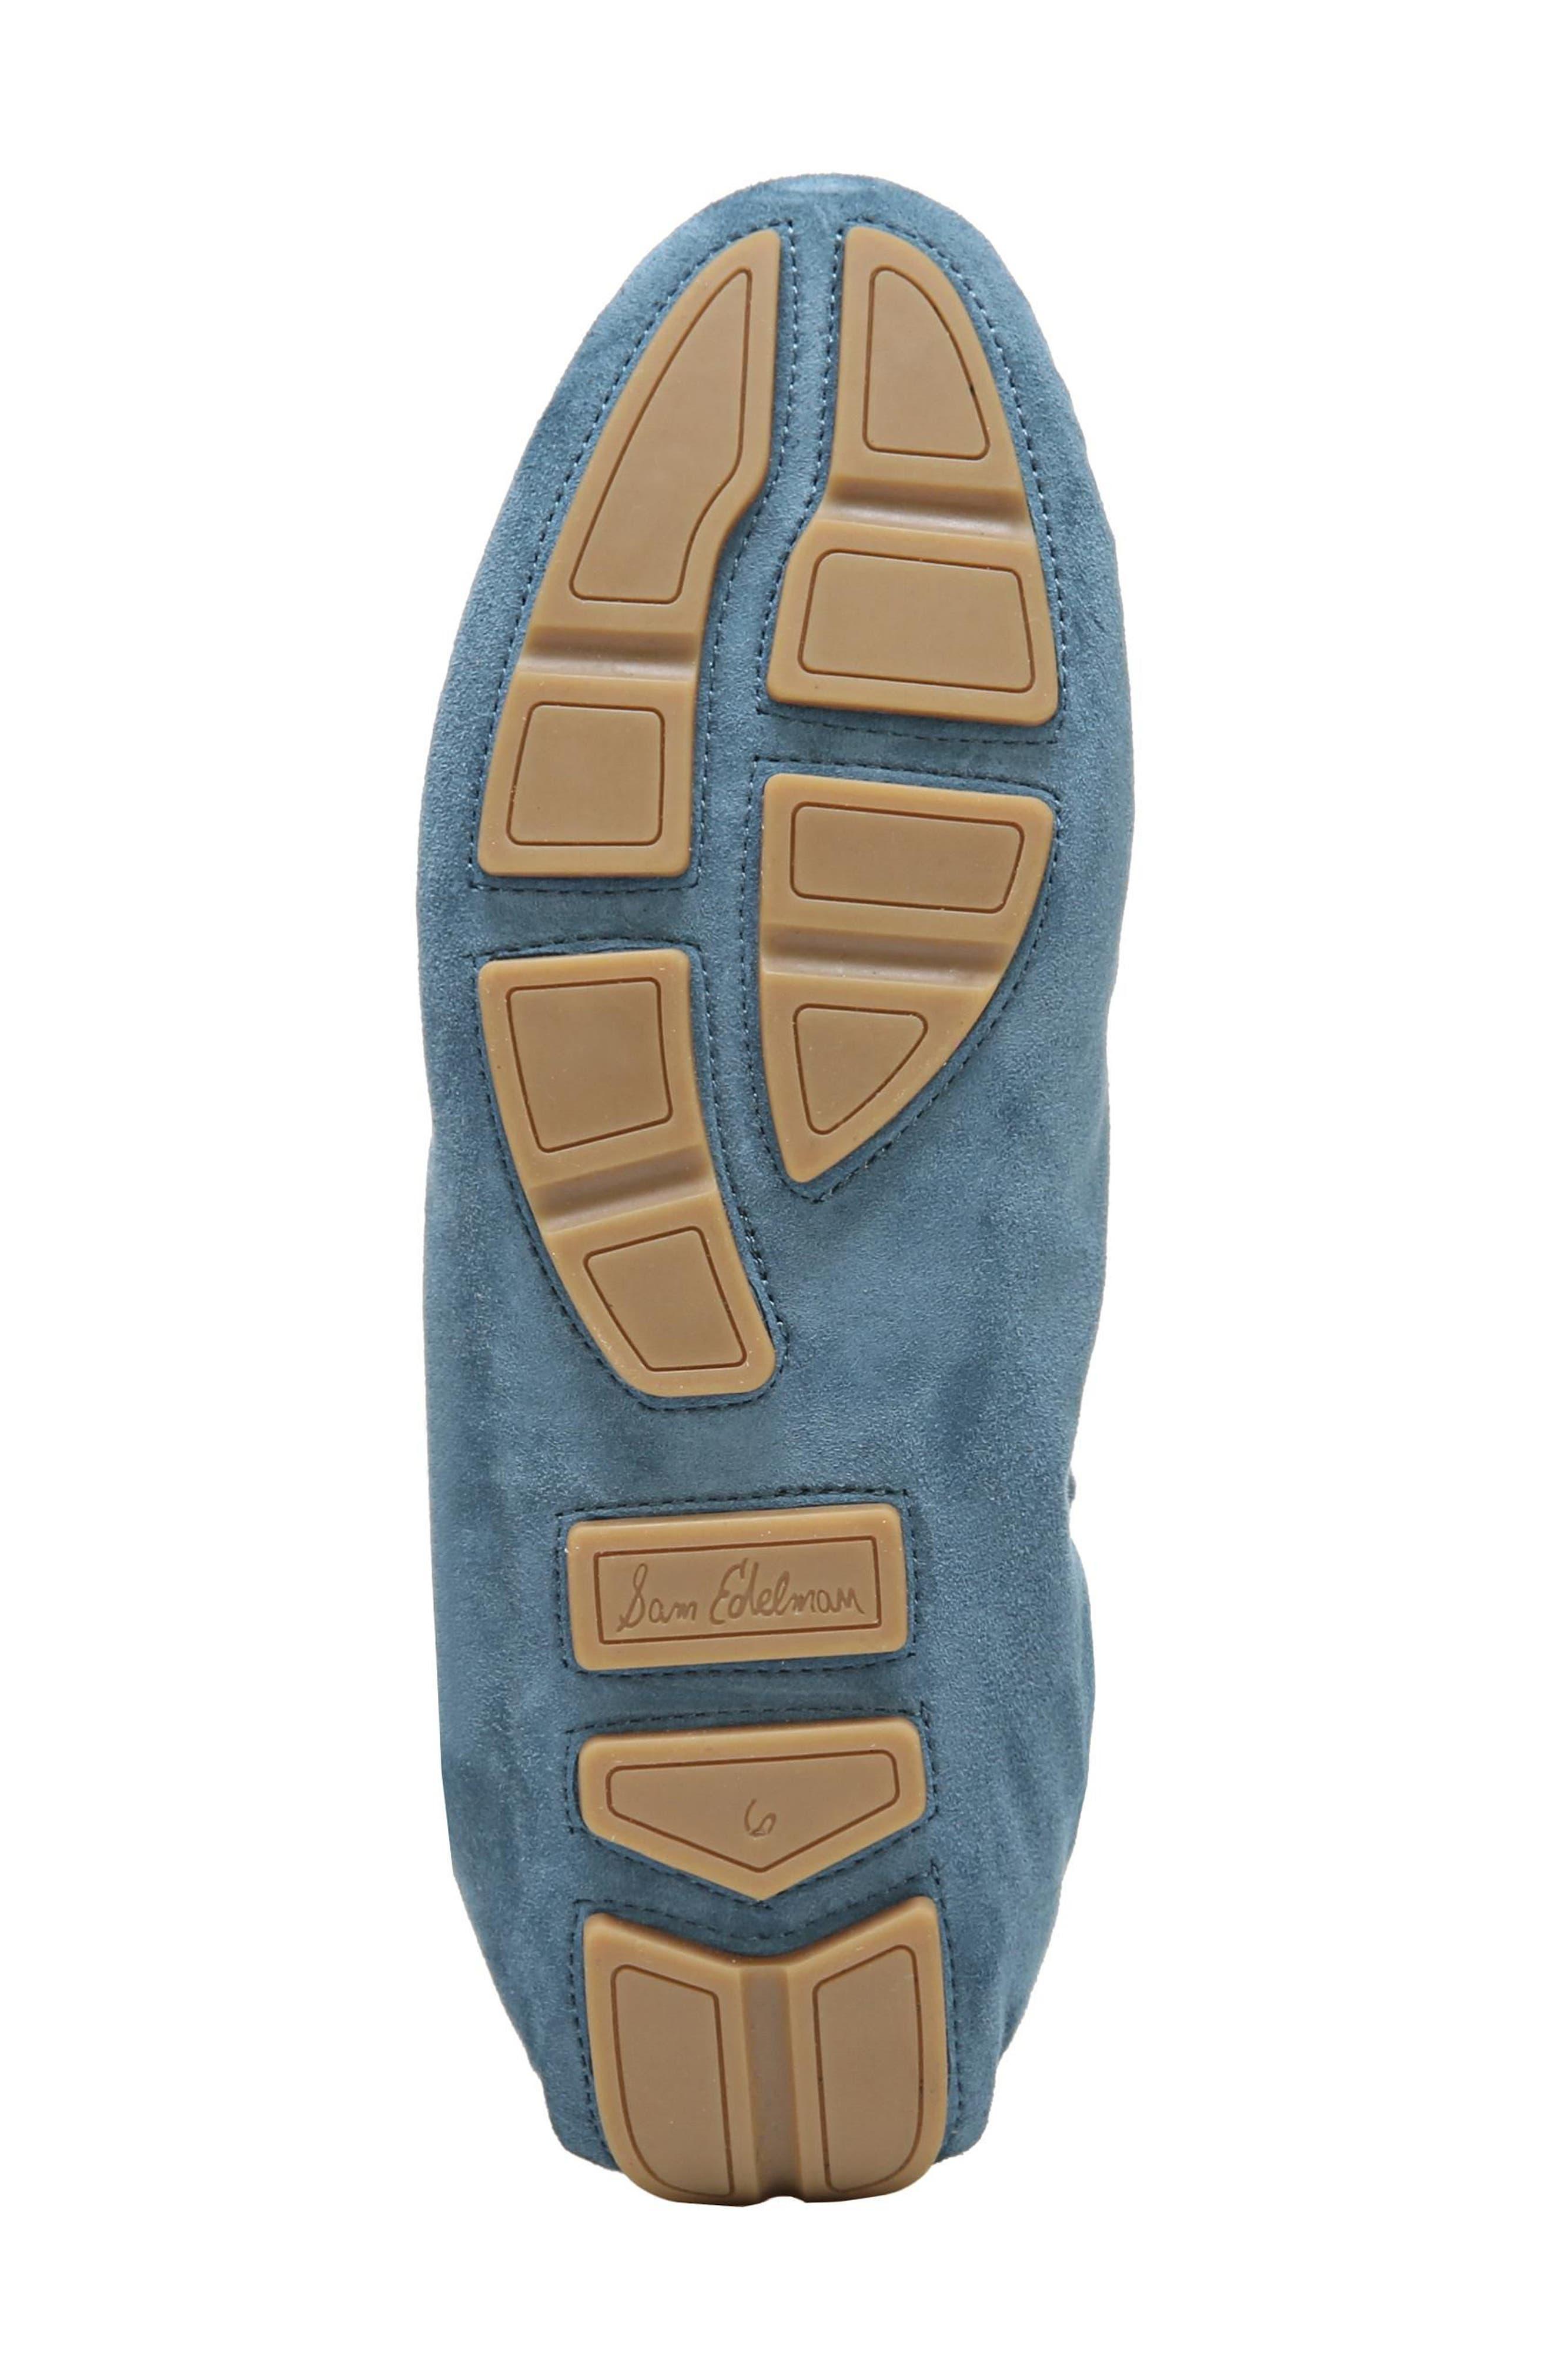 Farrell Moccasin Loafer,                             Alternate thumbnail 6, color,                             Denim Blue Suede